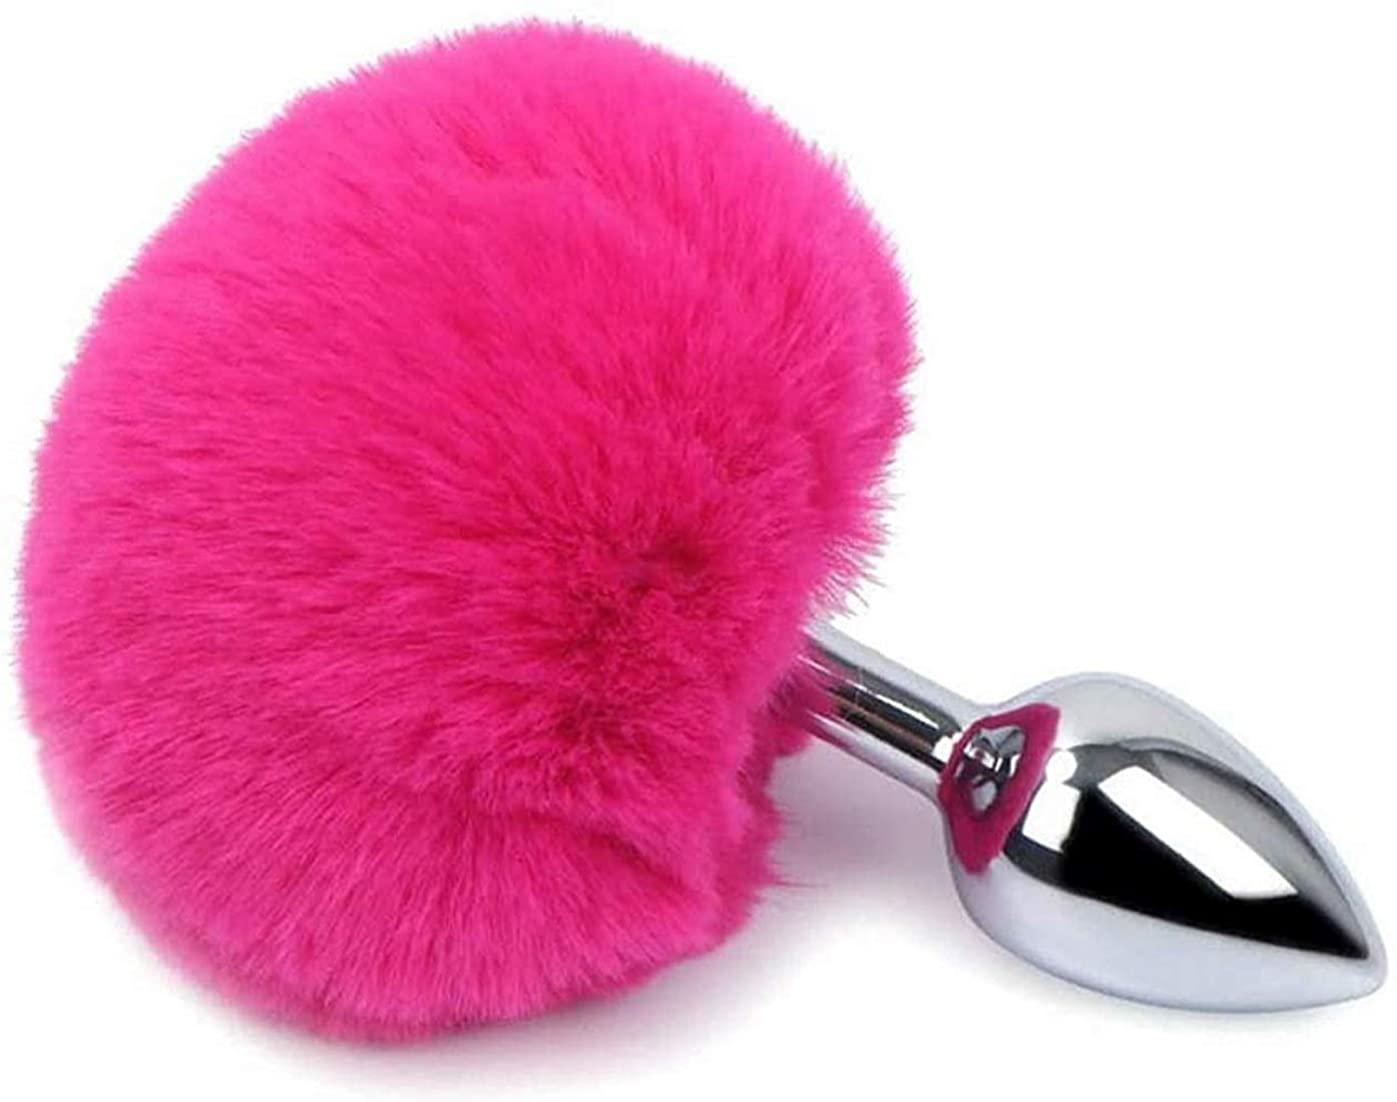 Generi c Adult Toys Bu-tt Pl'ugs for women